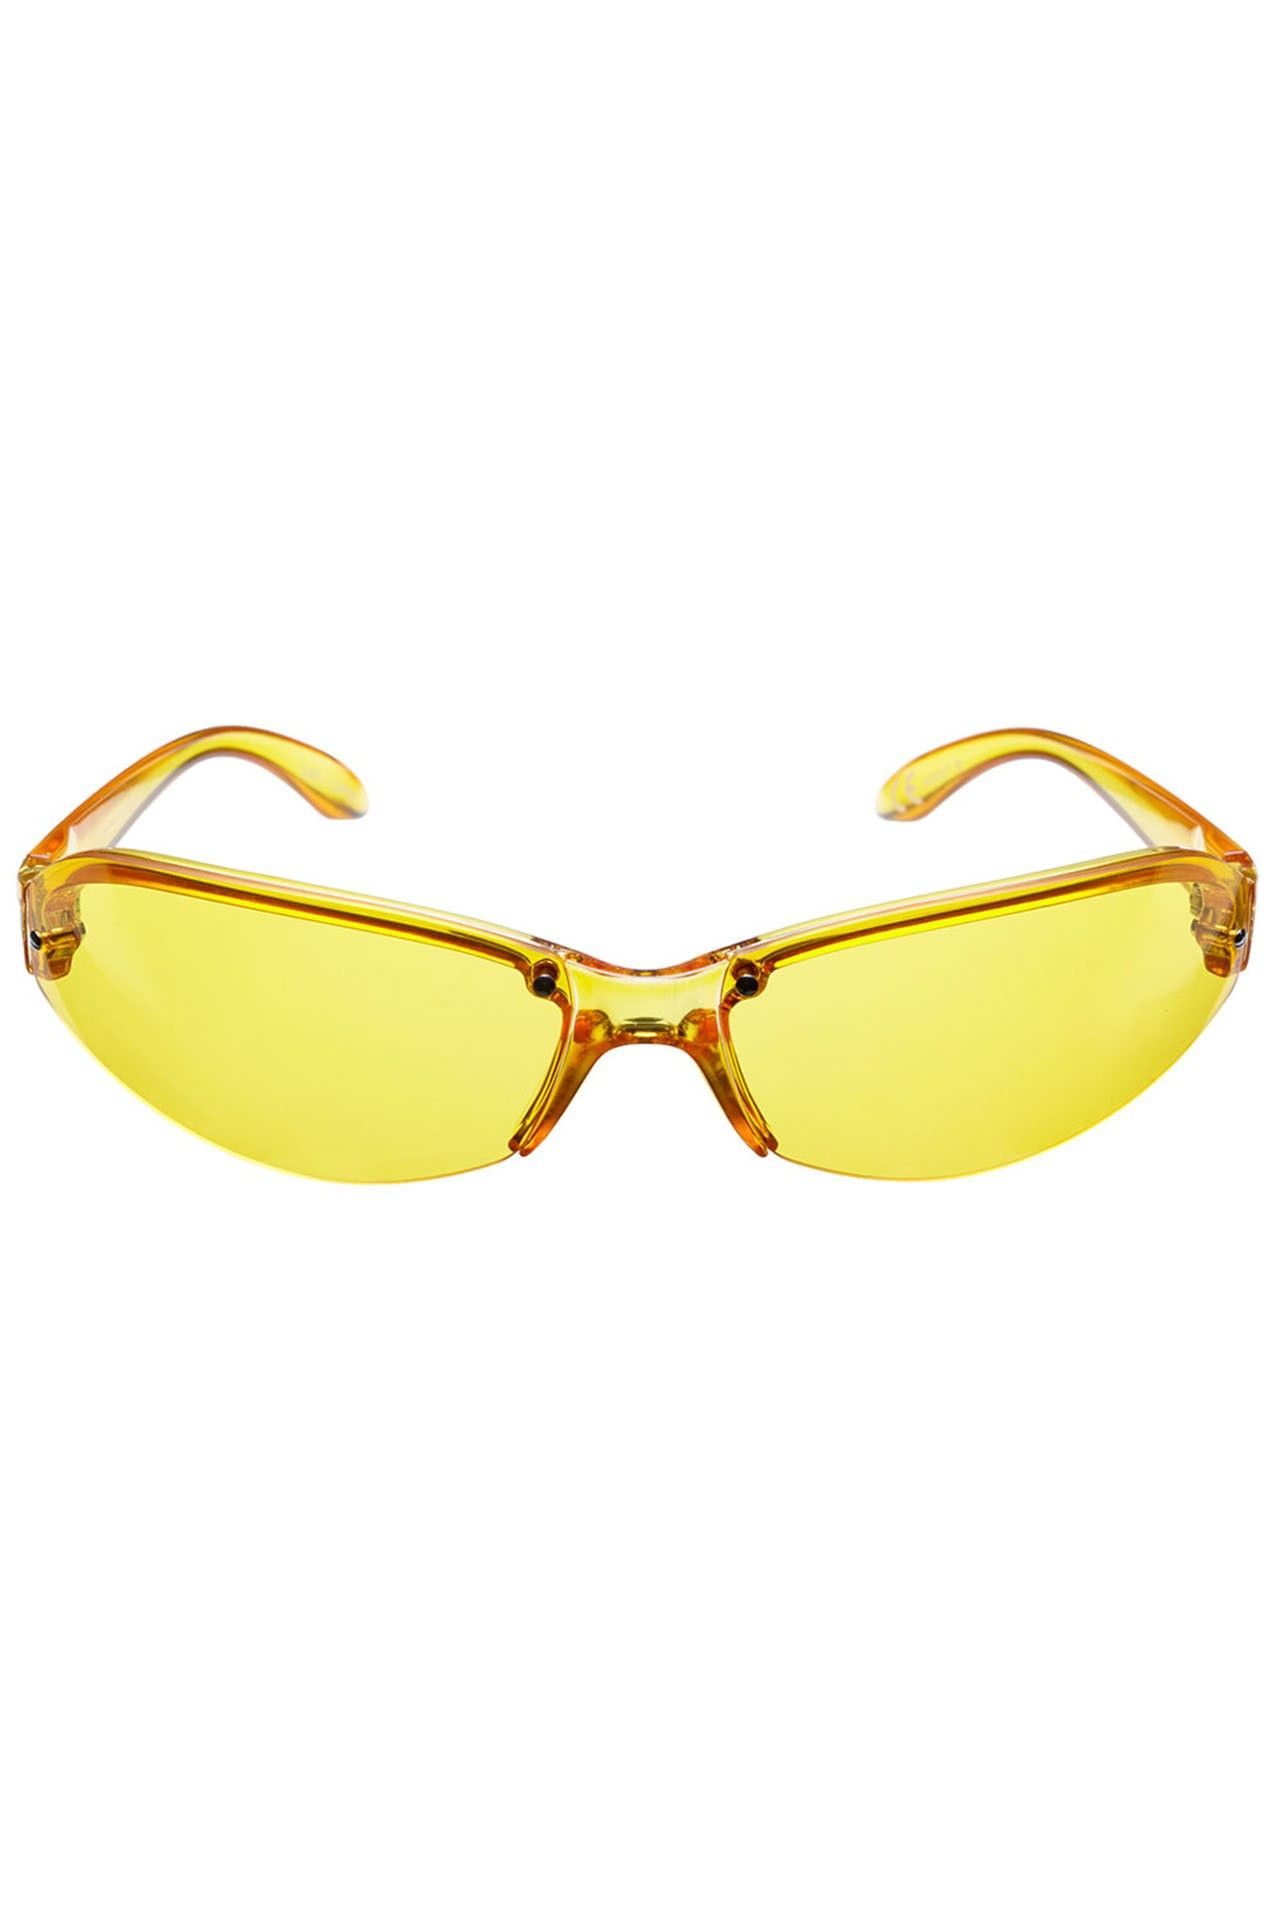 Afbeelding van Icon Eyewear Zonnebril 40097 Clear Yellow E